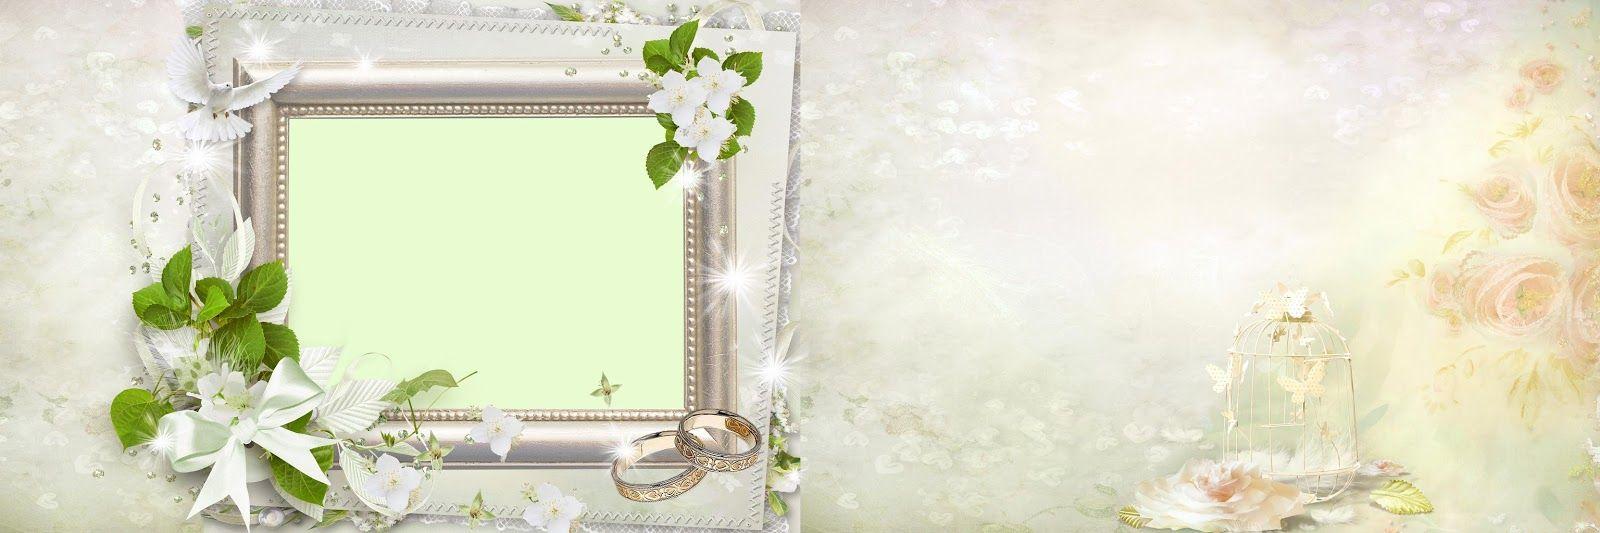 Karizma Album Design 12x36 With Flower Photo Frame | Luckystudio4u ...